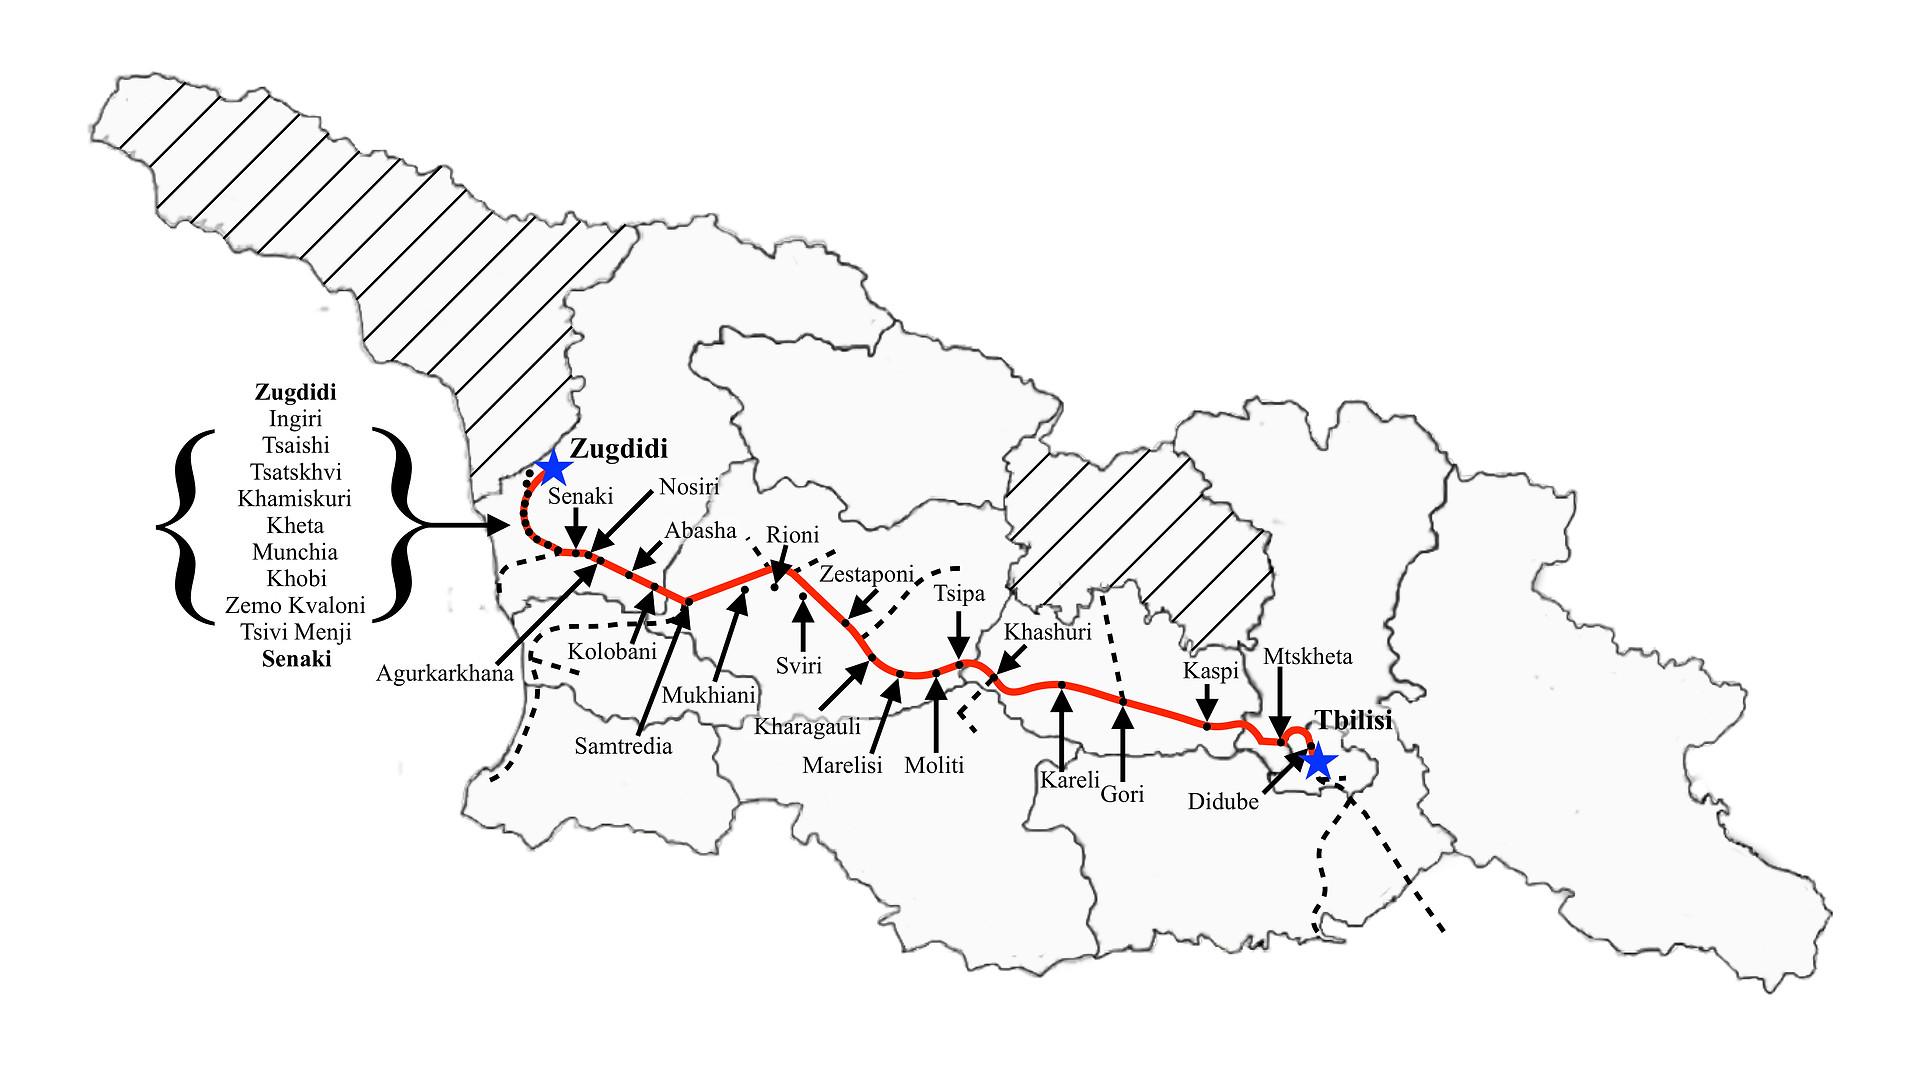 Zugdidi to Tbilisi (Night)